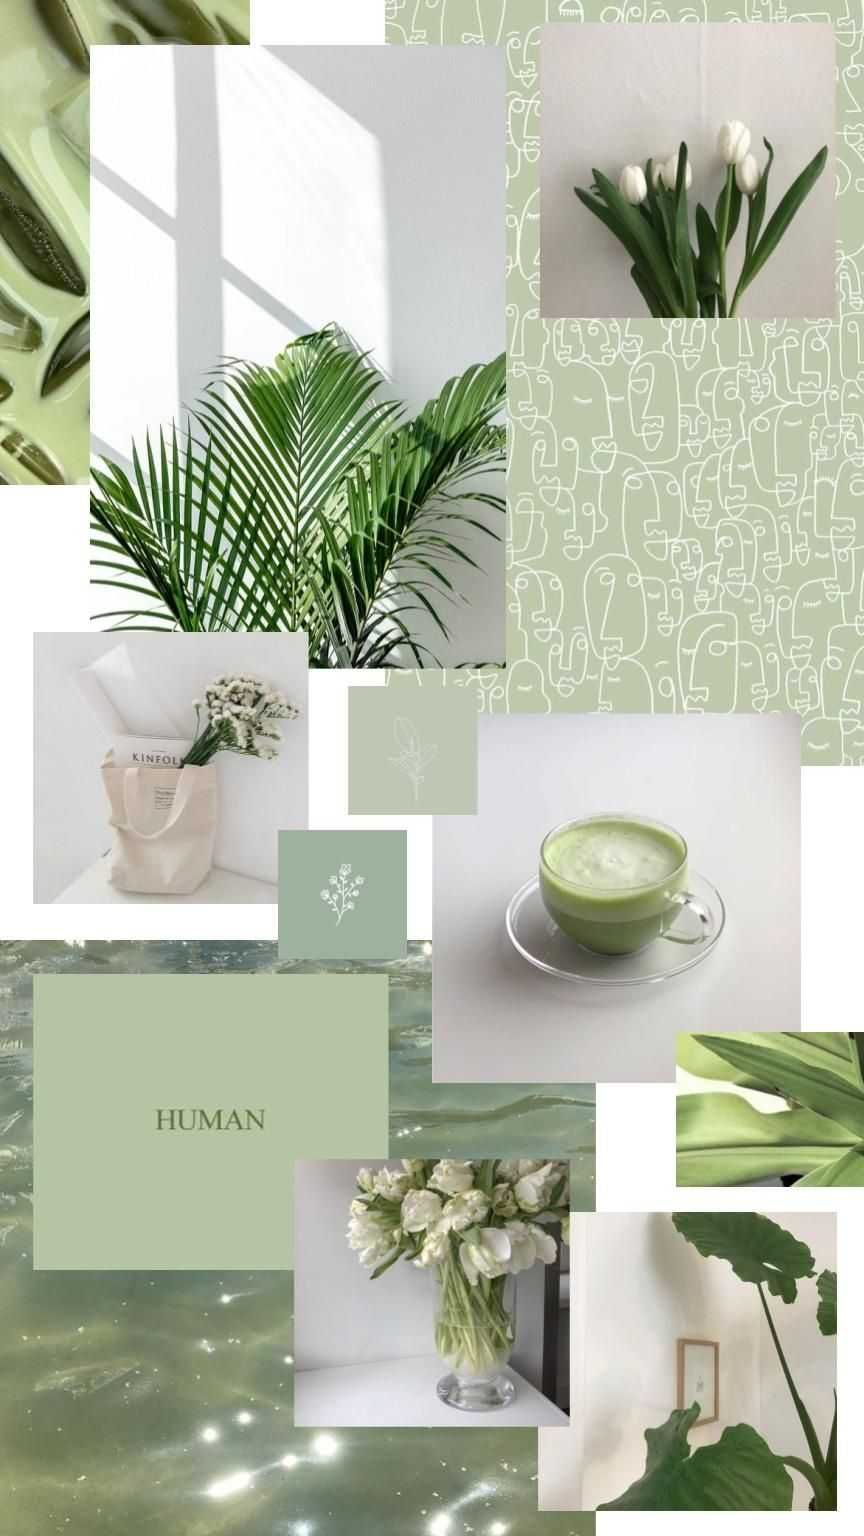 Sage Green Aesthetic Wallpaper - NawPic